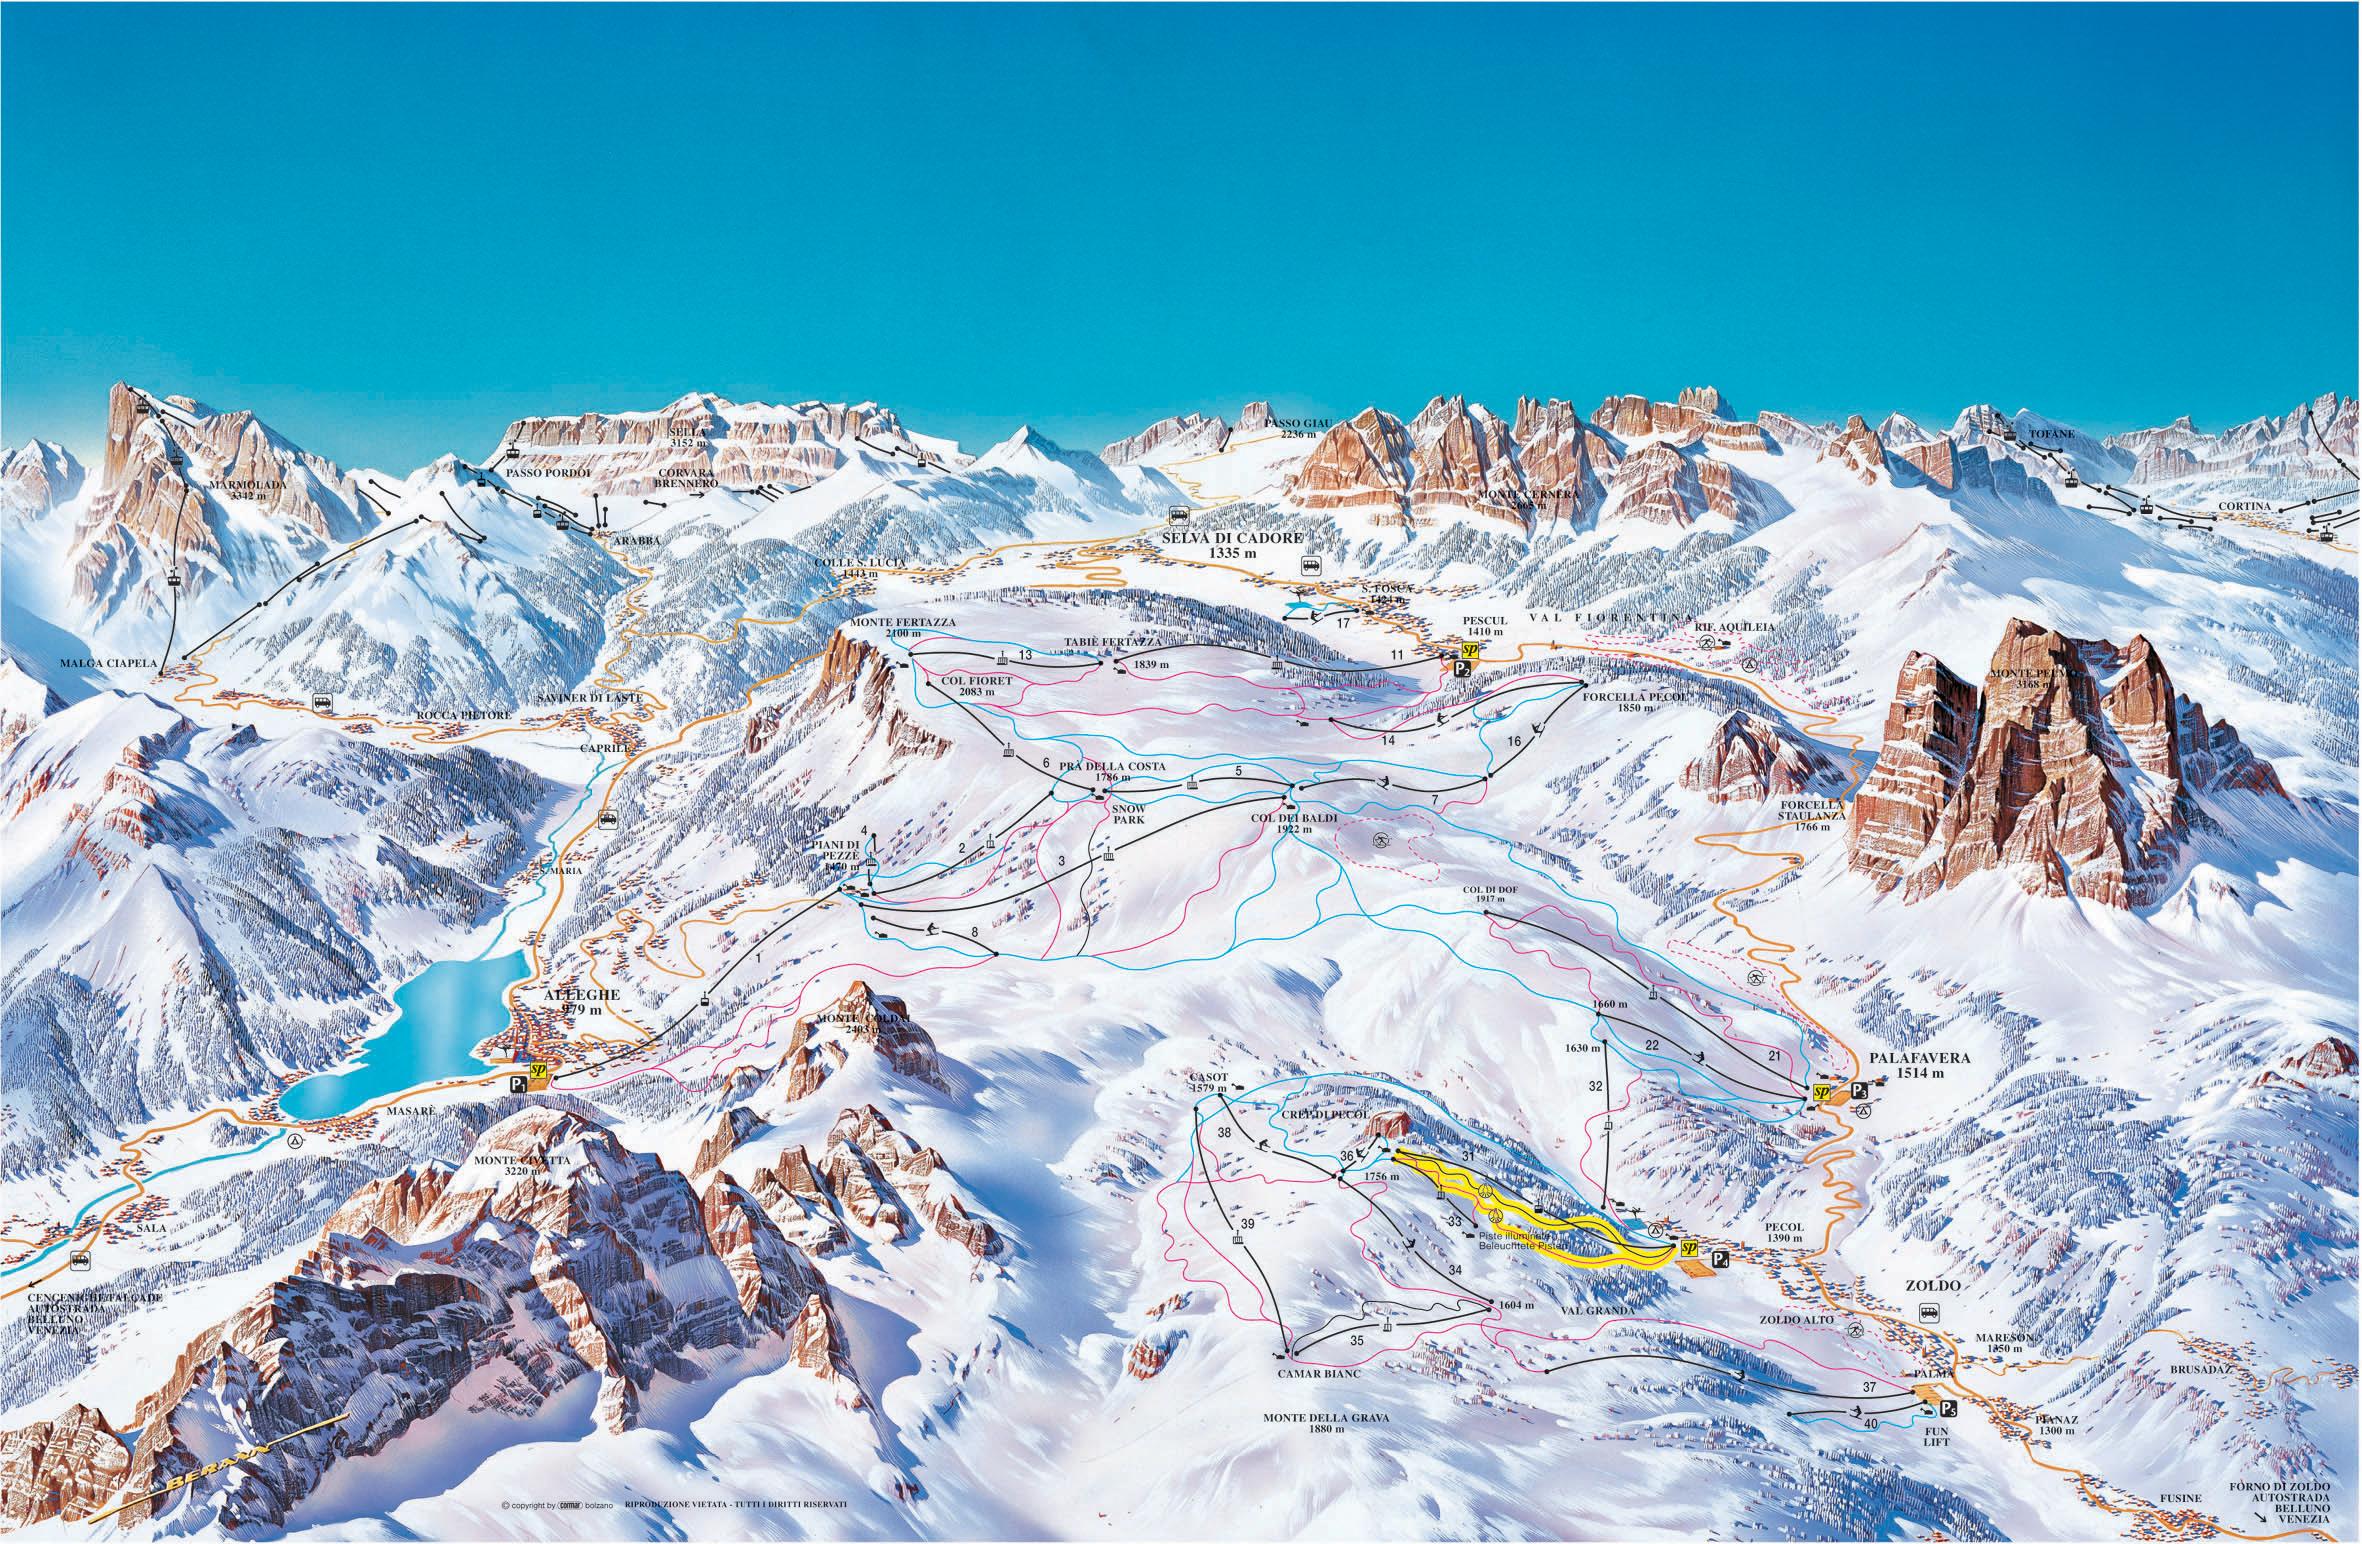 Civetta ski map Dolomiti Superski Italy Europe